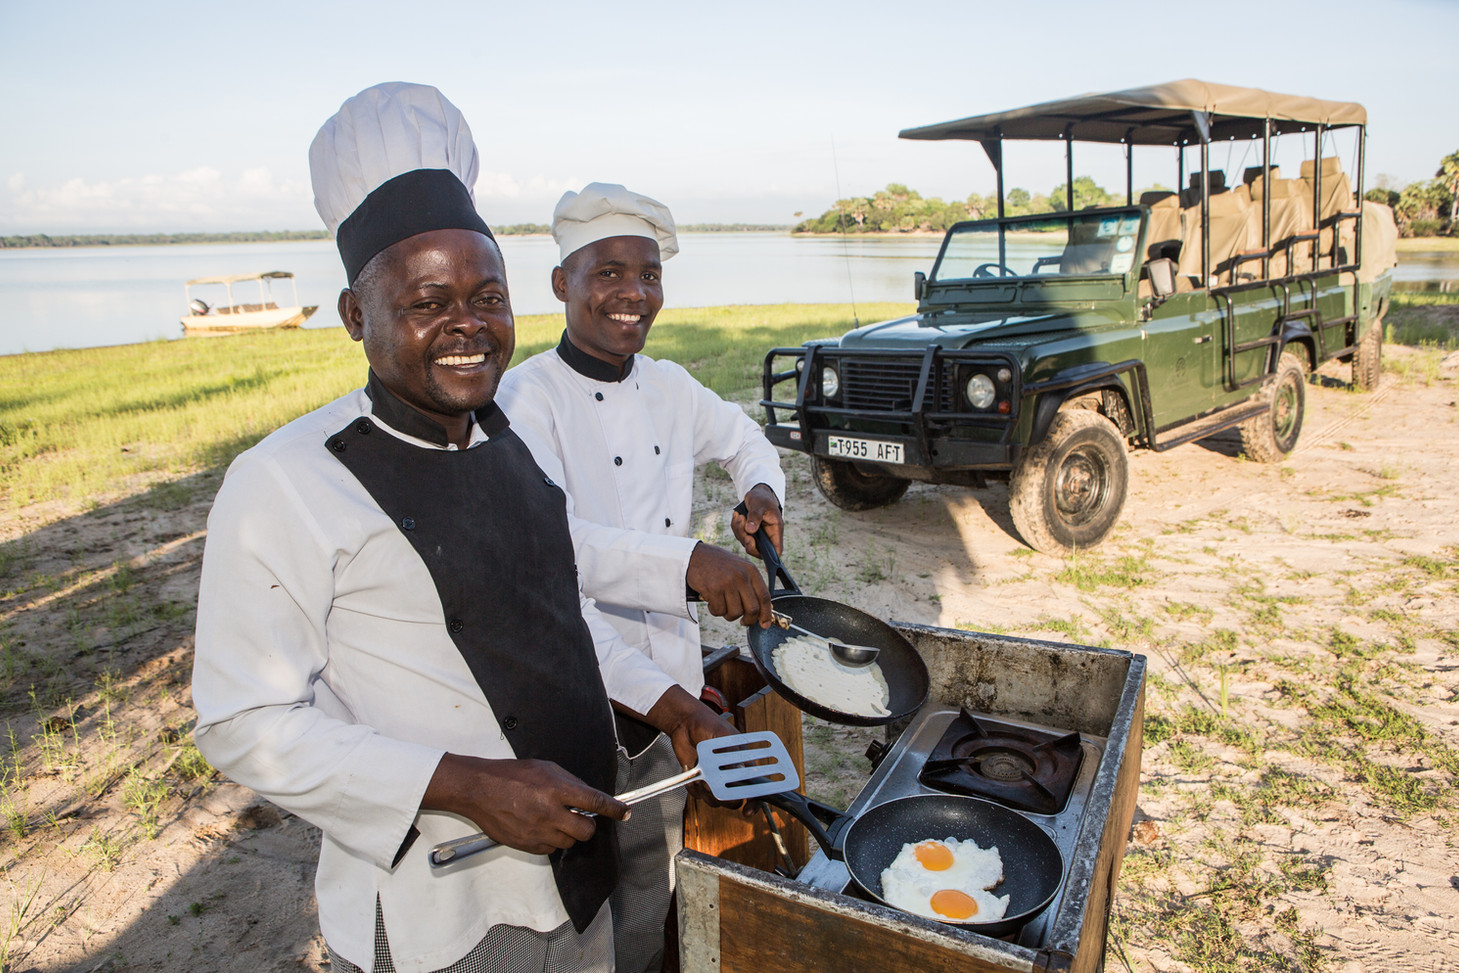 Bush Breakfast at Siwandu, Nyerere, Selous